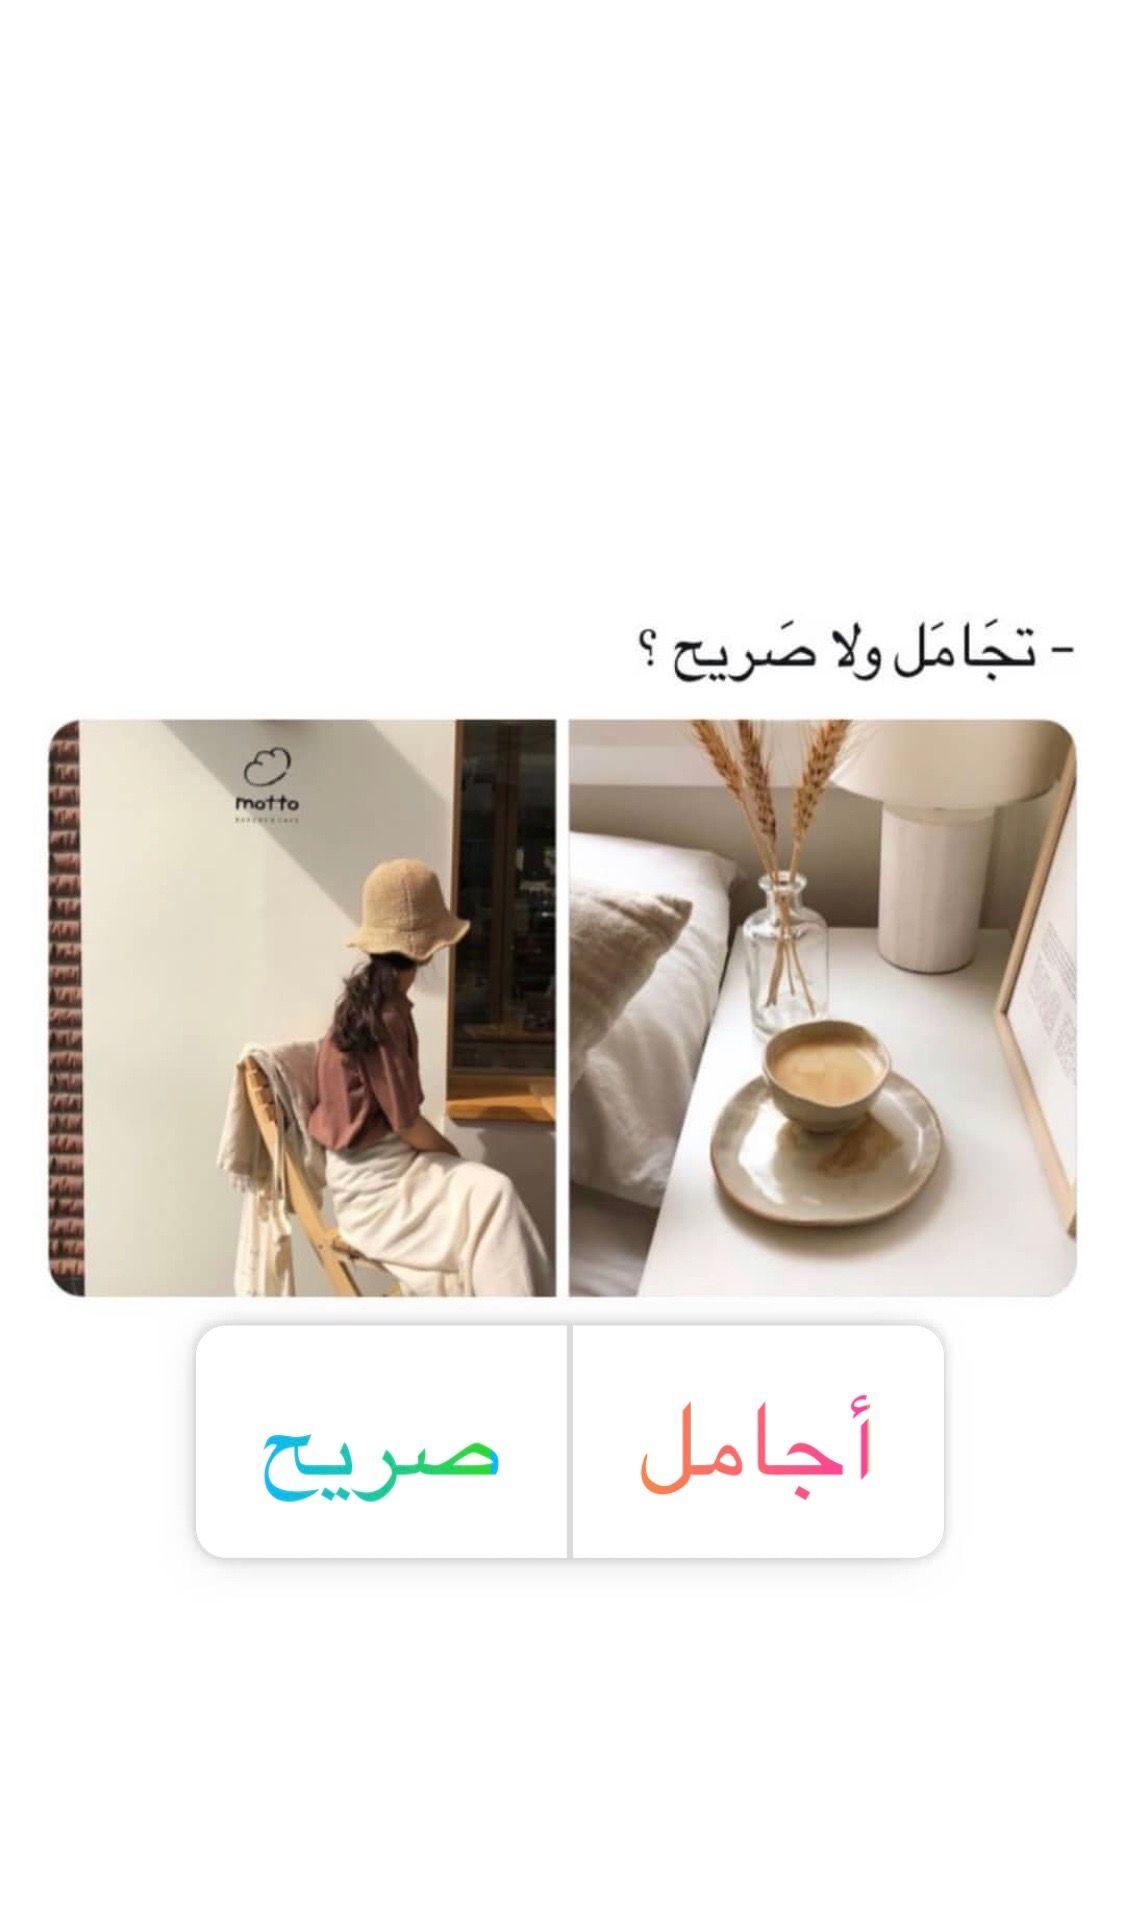 نص ونص حسب الموقف احس انه الصراحة تكون جارحه أحيانا Funny Picture Quotes Funny Arabic Quotes Instagram Story Questions